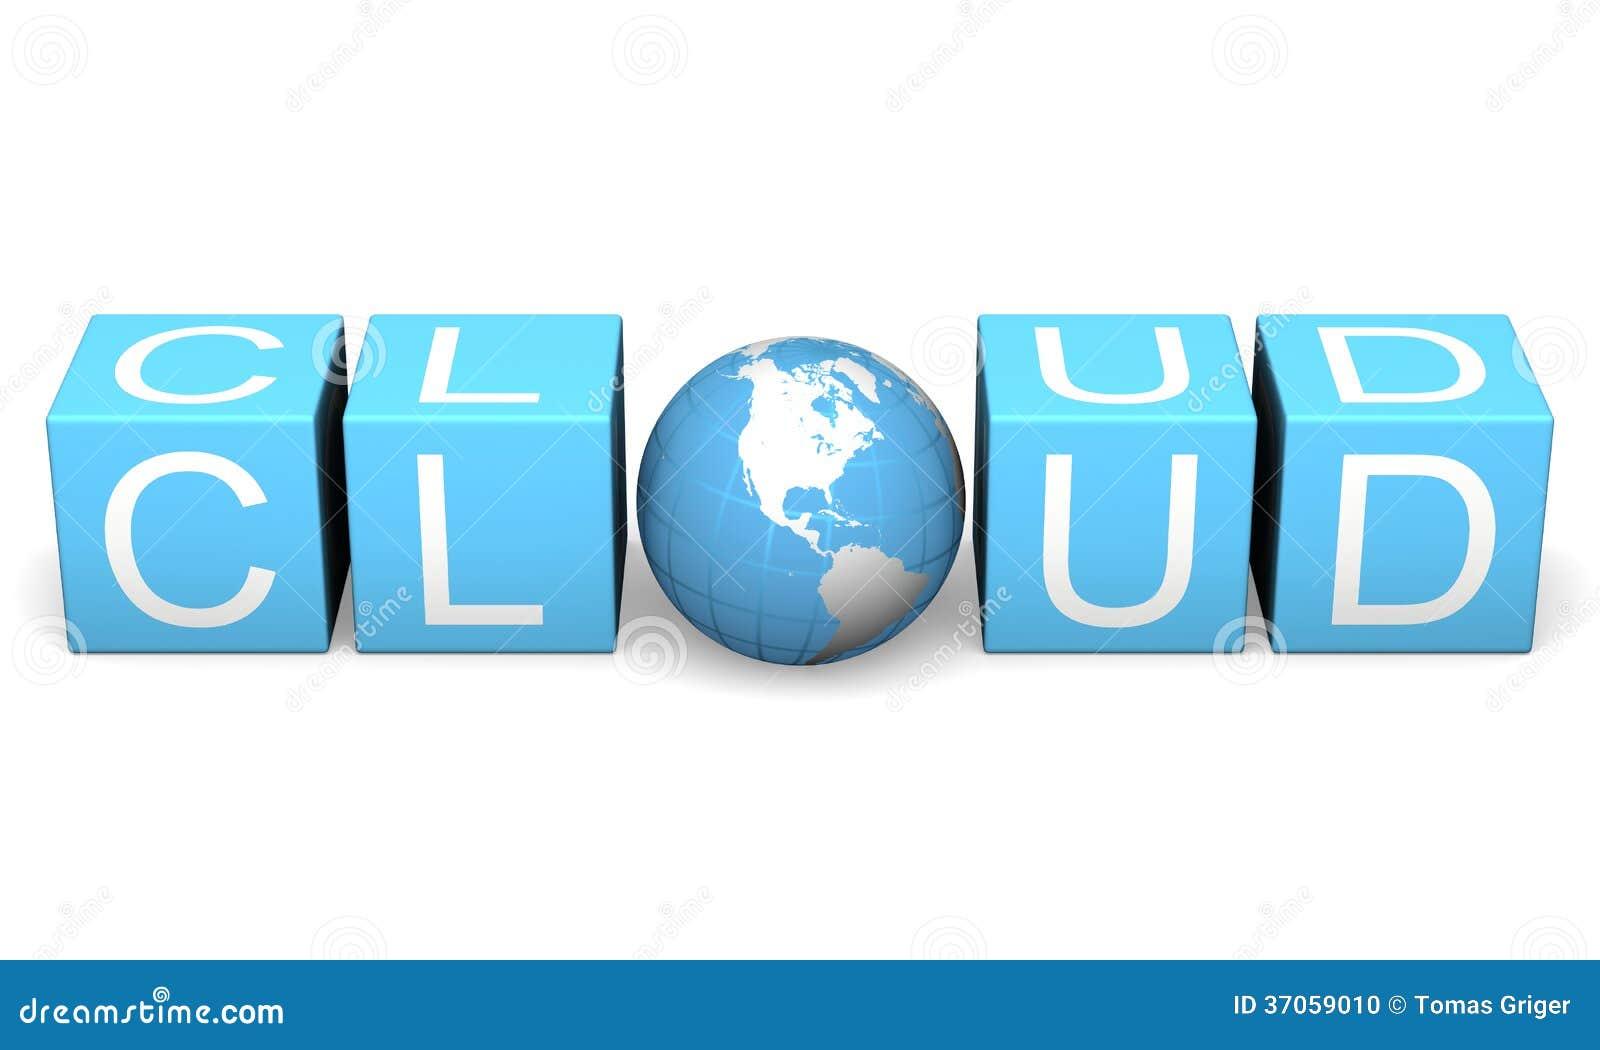 Cloud Computing Stock Photo - Image: 37059010